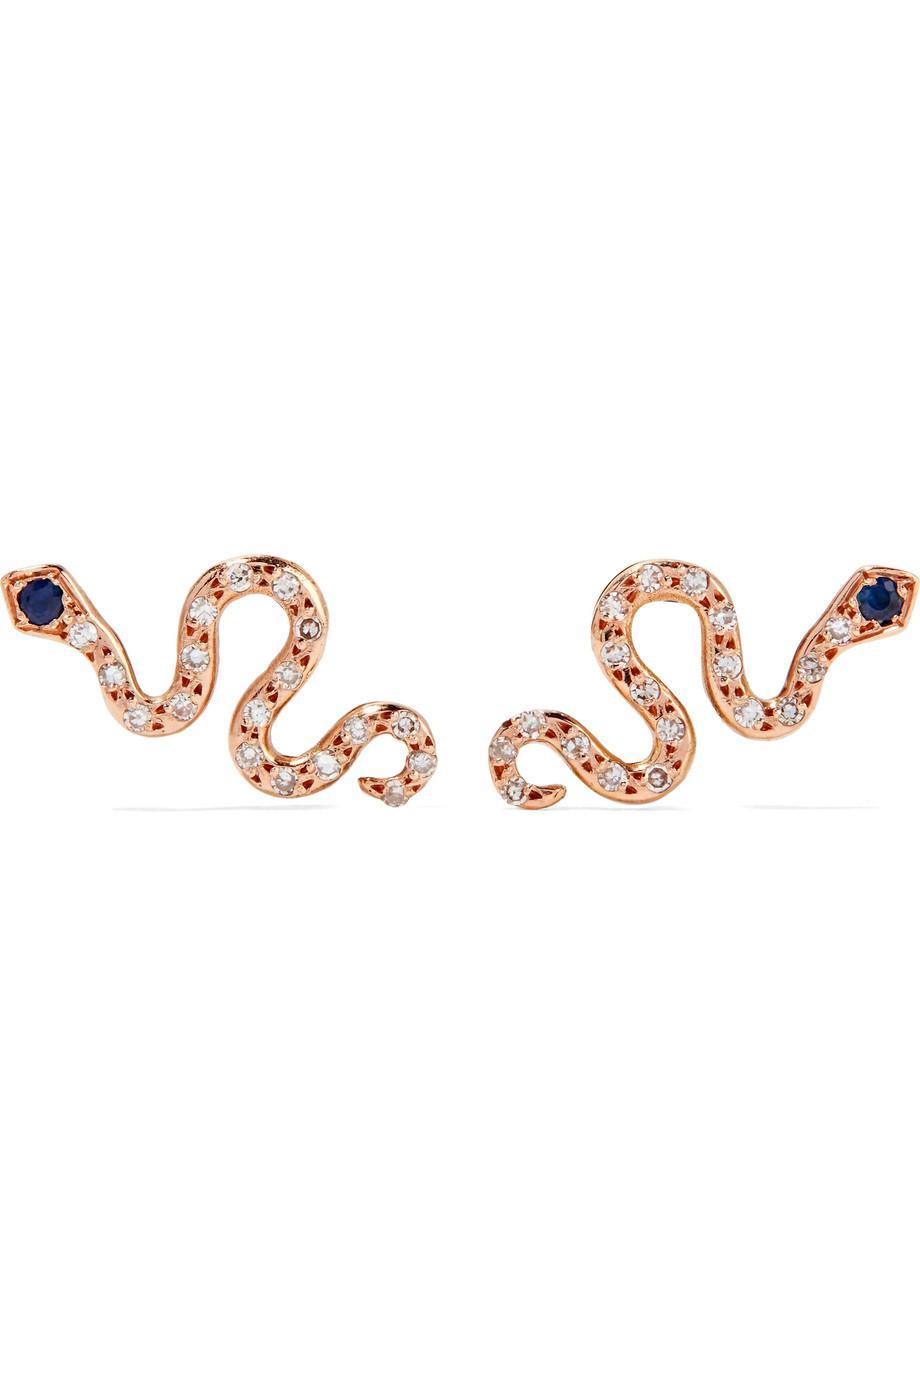 Ileana Makri Little Snake 18-karat Rose Gold, Diamond And Sapphire Earrings